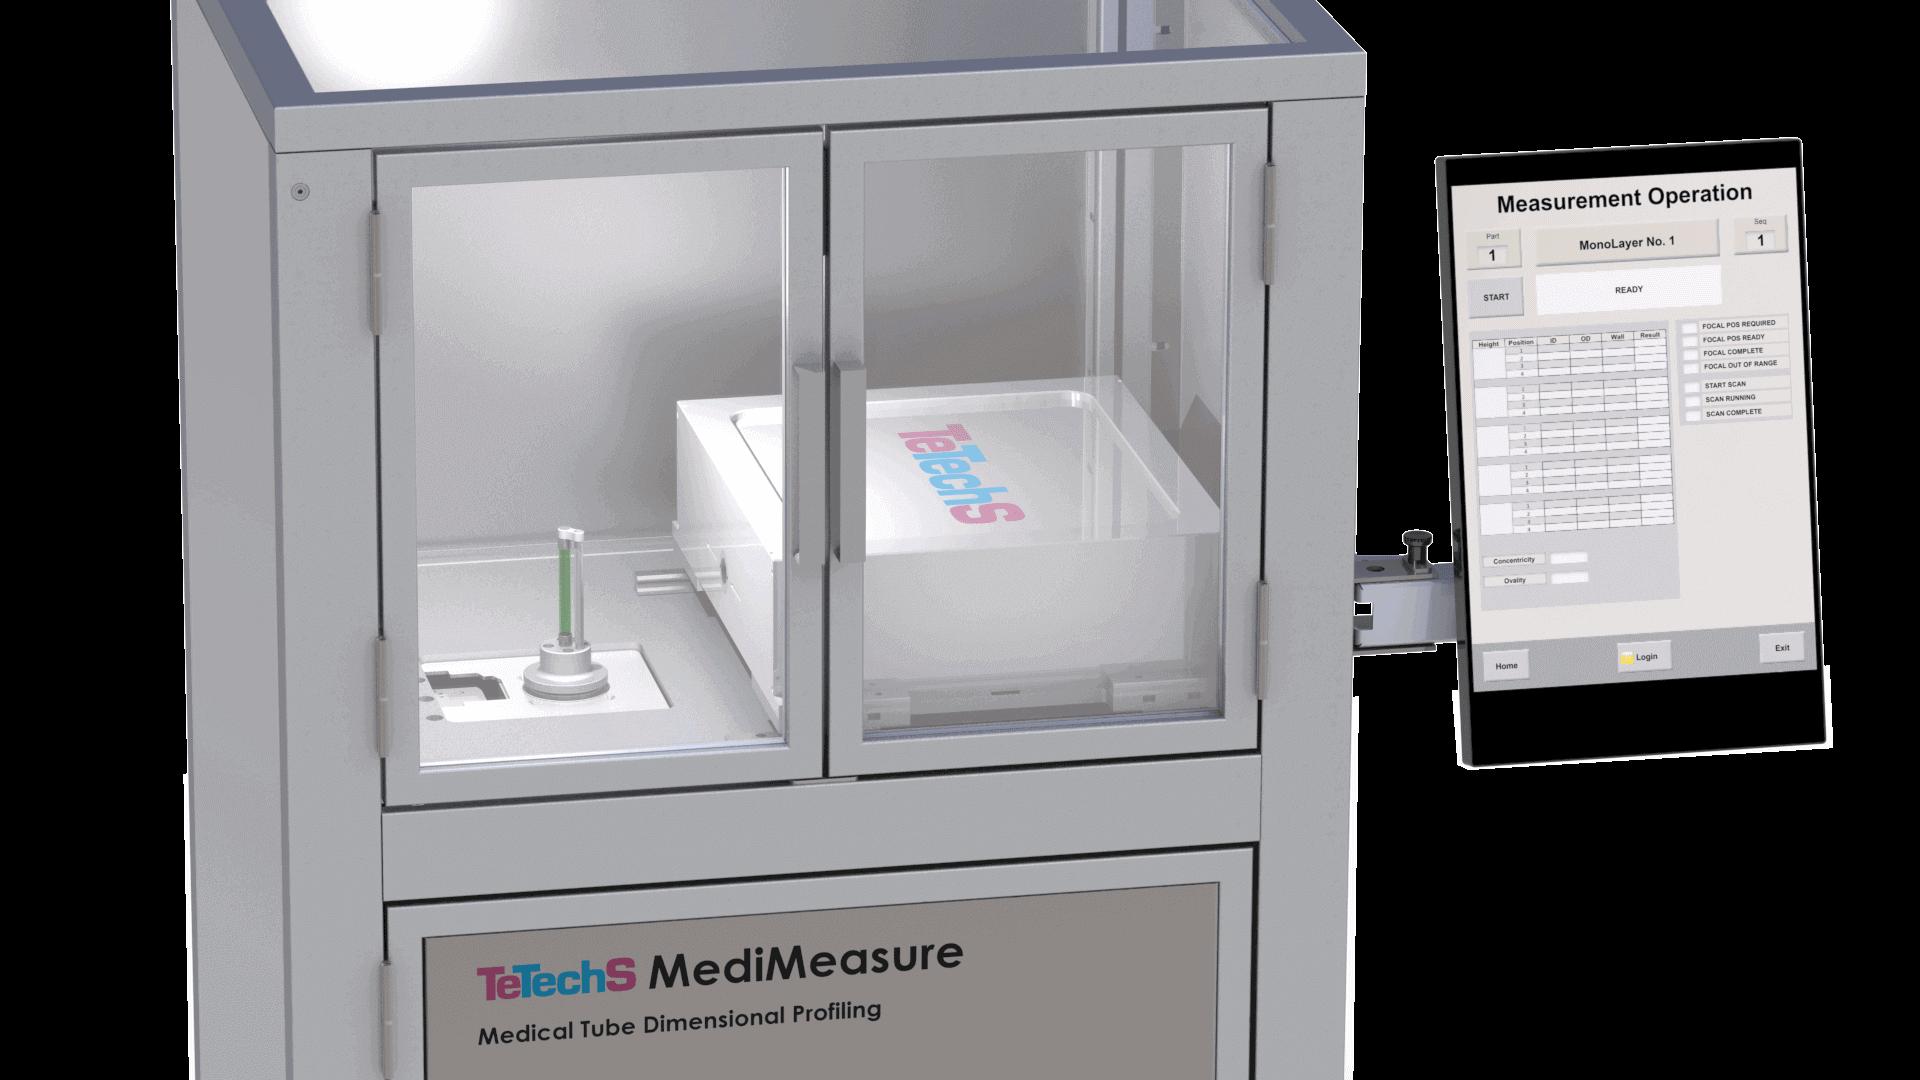 TeTechS MediMeasure